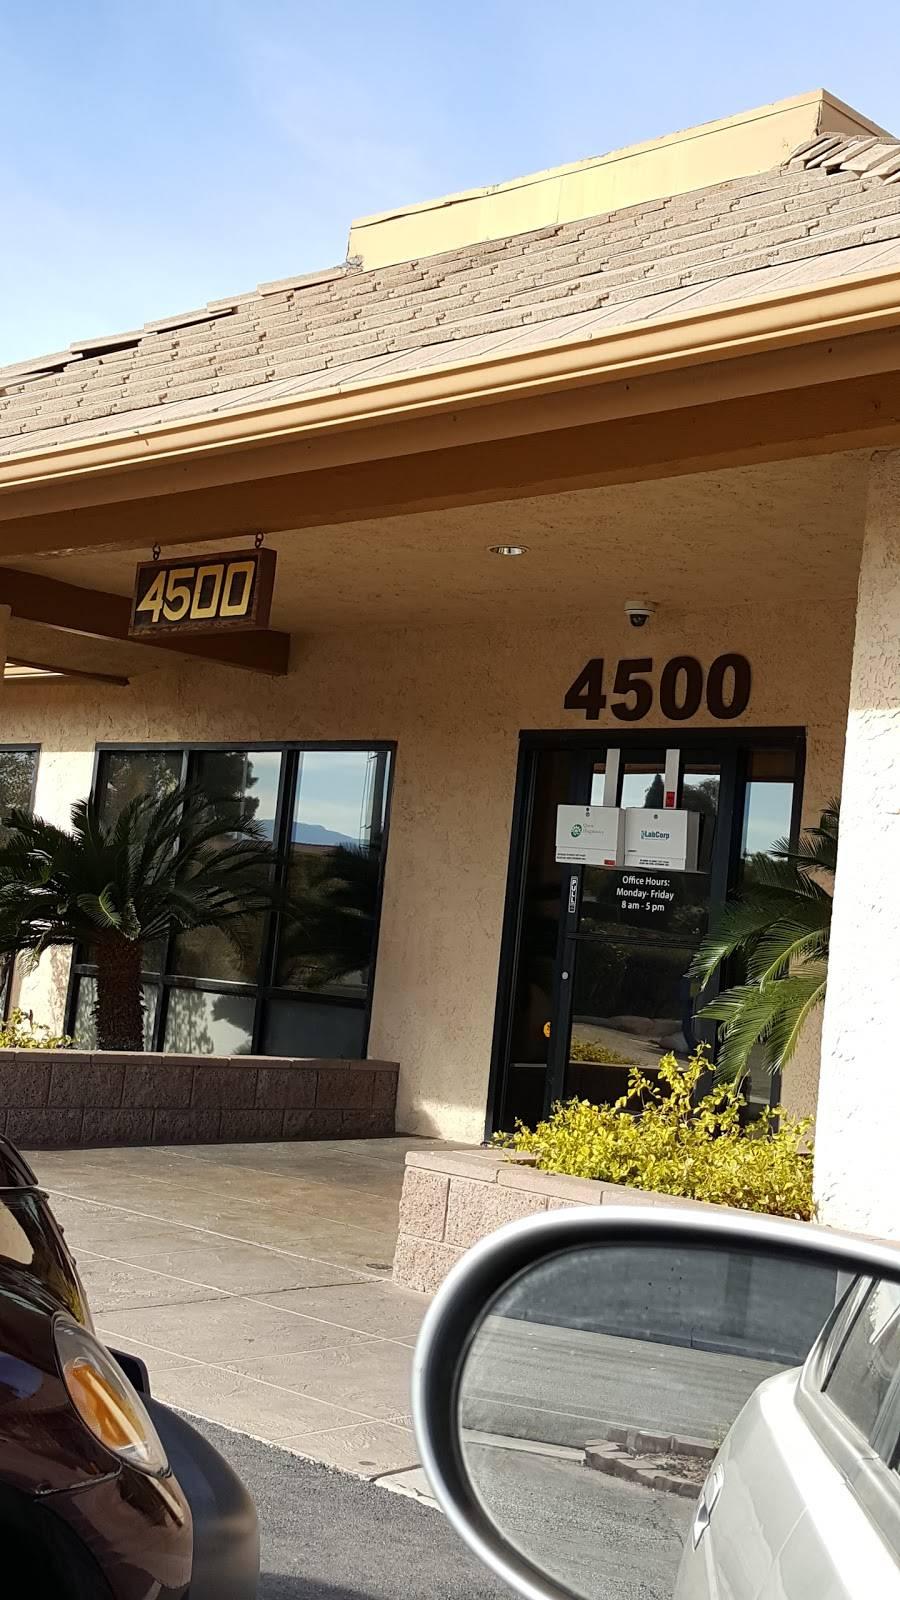 Community Family Doctors - doctor  | Photo 5 of 5 | Address: 4500 W Oakey Blvd, Las Vegas, NV 89102, USA | Phone: (702) 873-5110